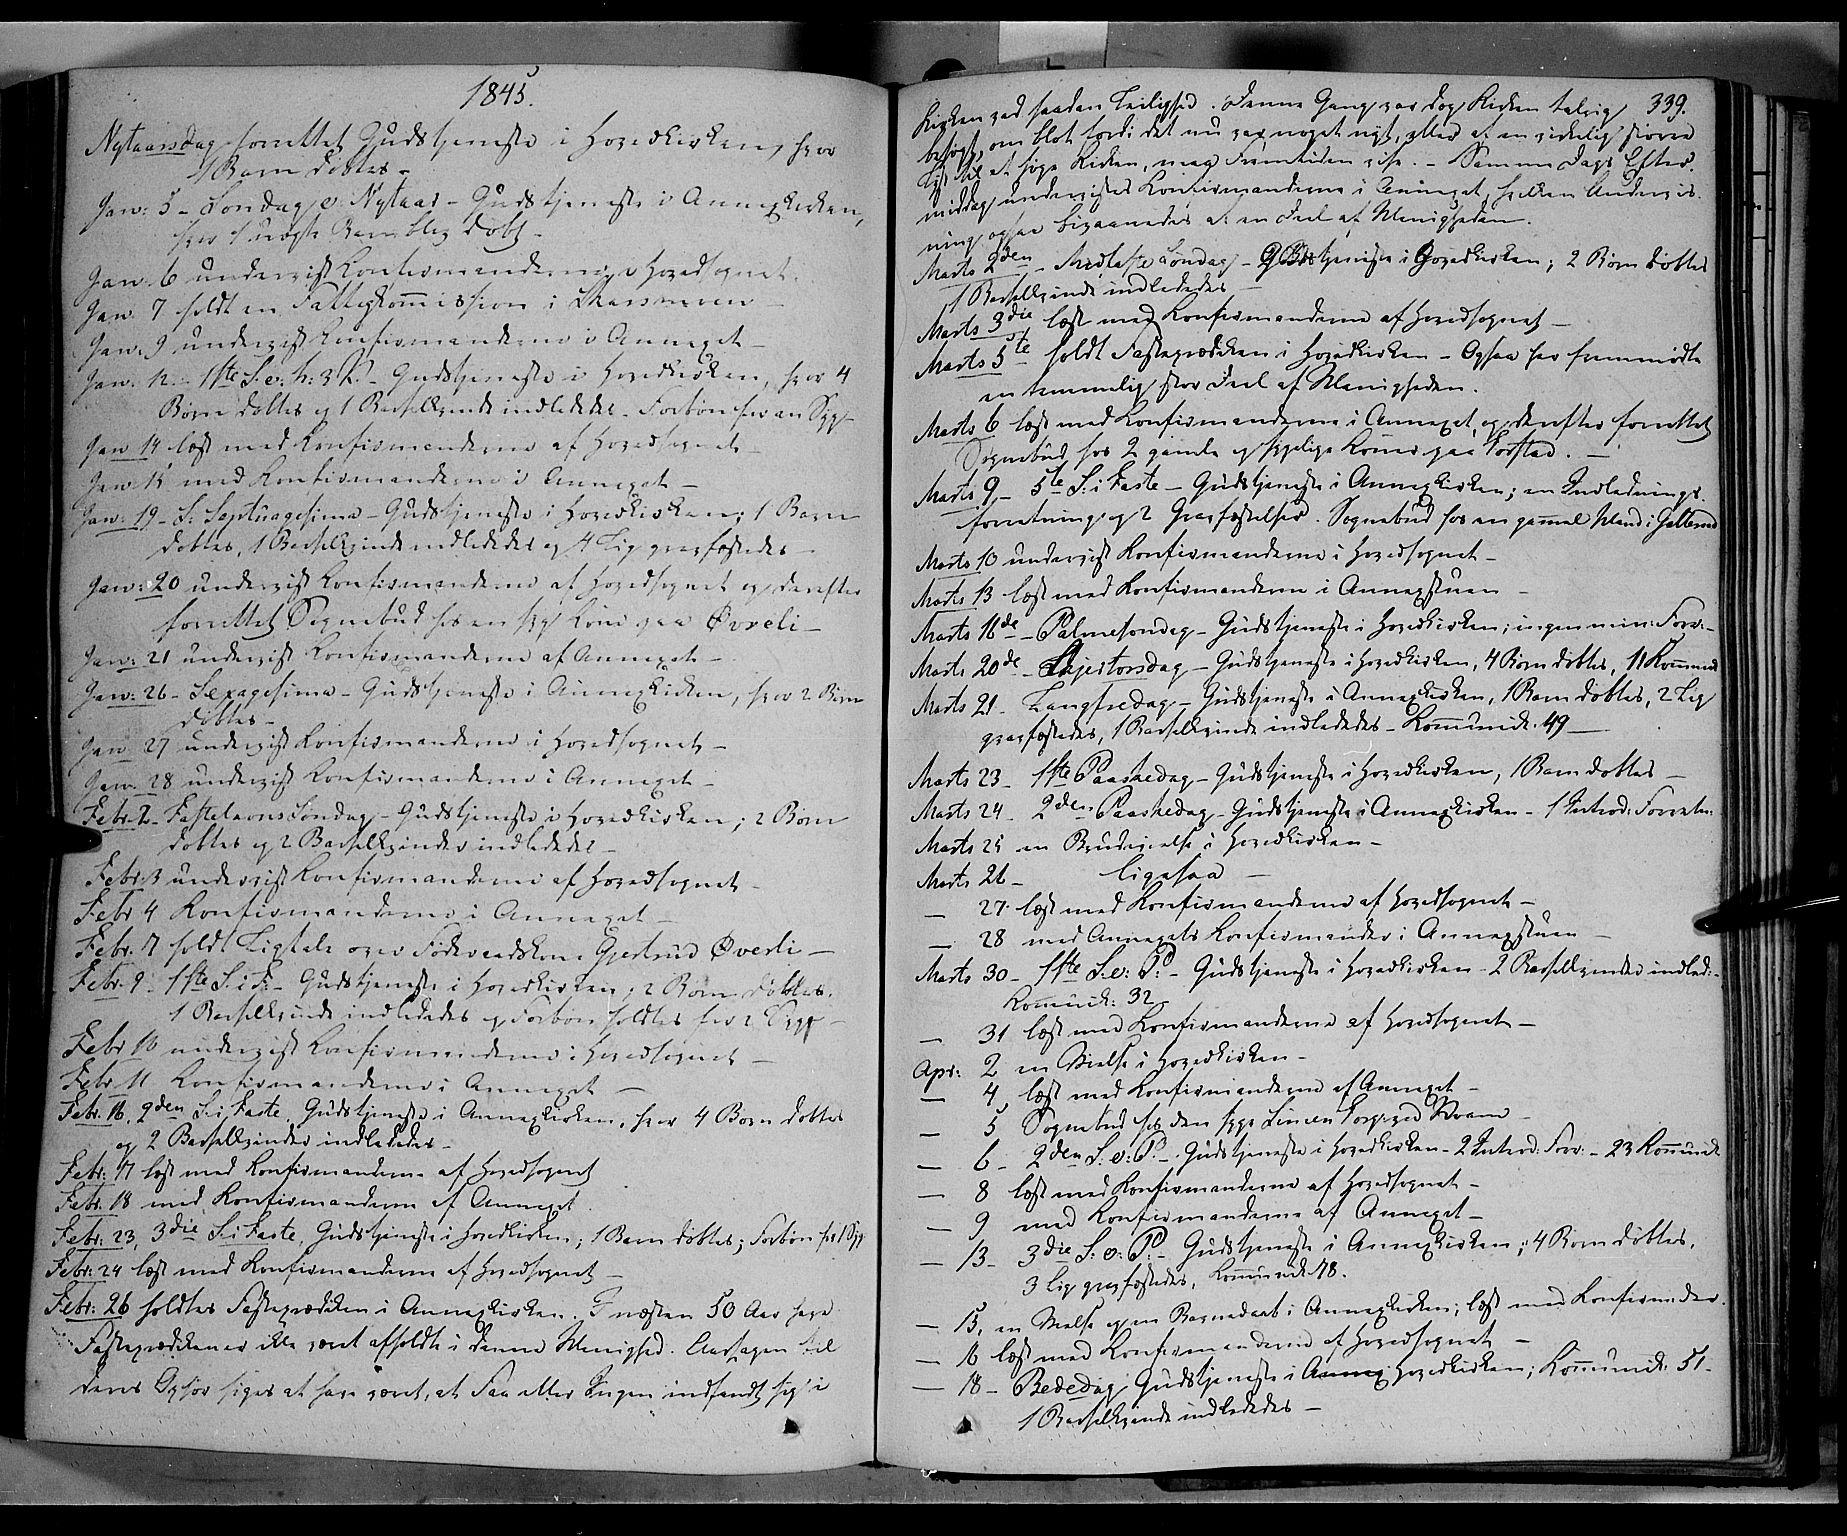 SAH, Øyer prestekontor, Ministerialbok nr. 5, 1842-1857, s. 339